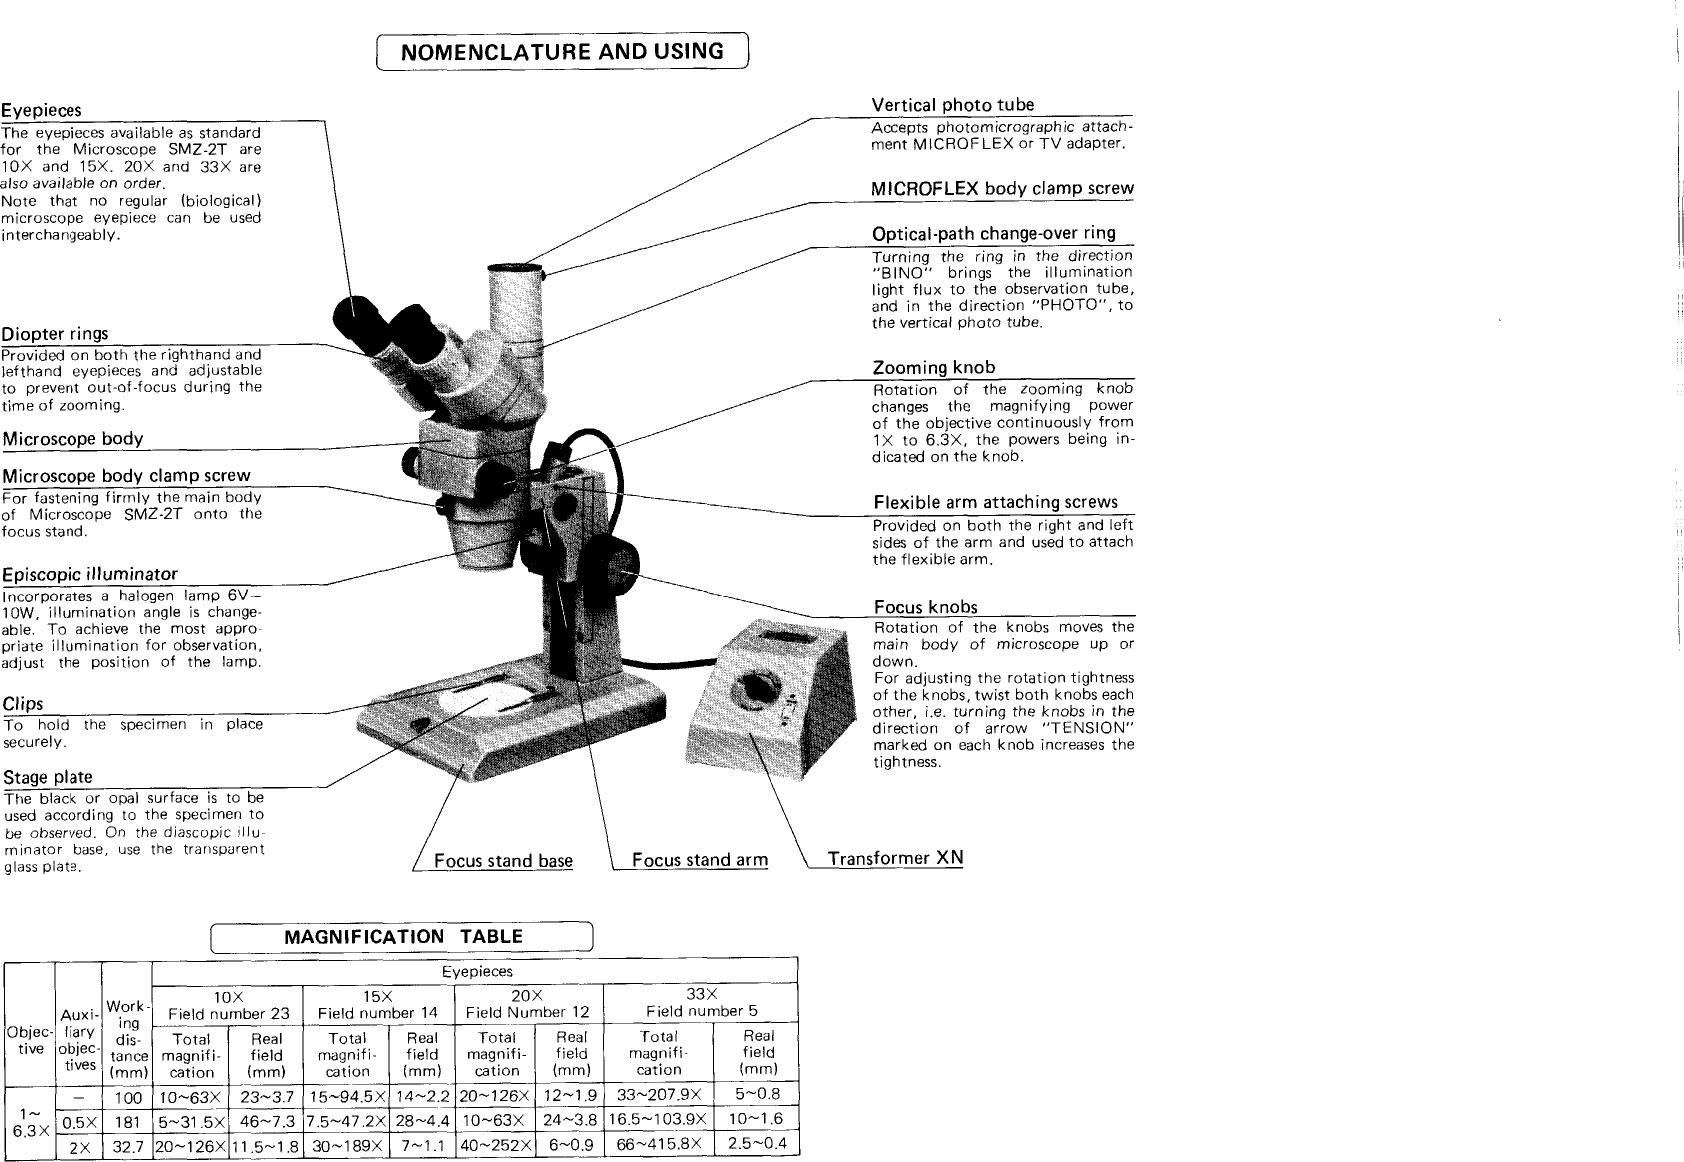 Nikon SMZ 2T Fvo7343.tmp User Manual To The 4a319fac a72b